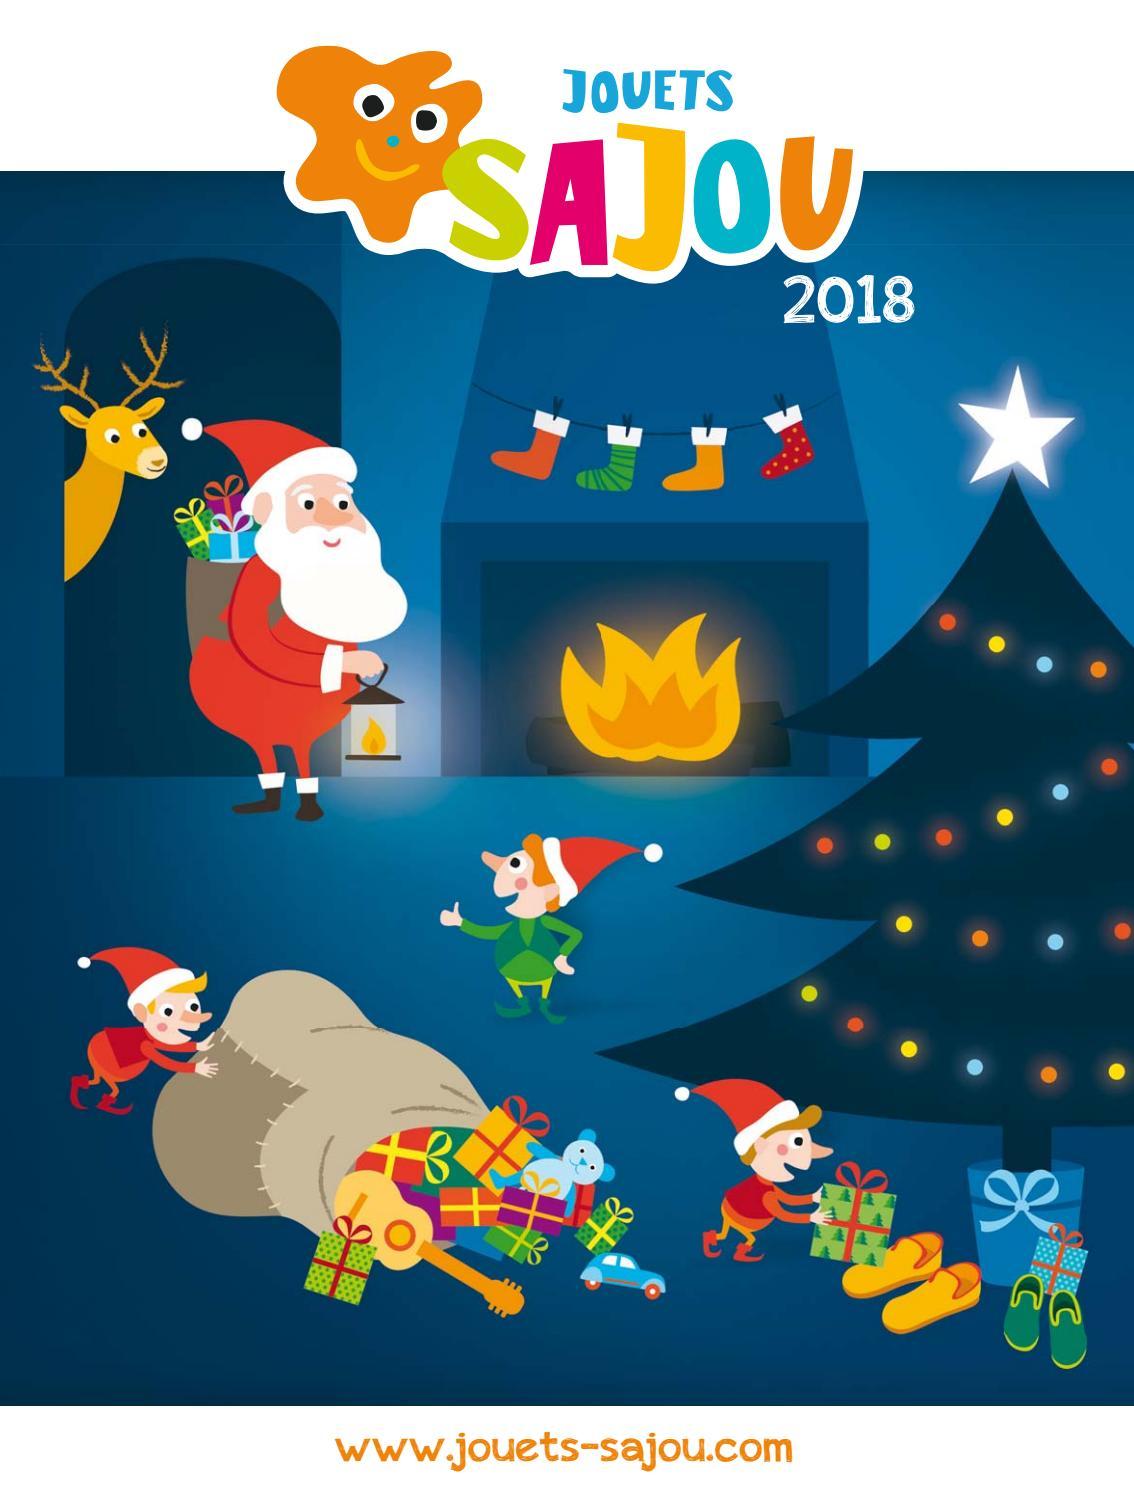 Jouets Noël By Yvernault Sajou 2018 Issuu Catalogue TPkXOZiu